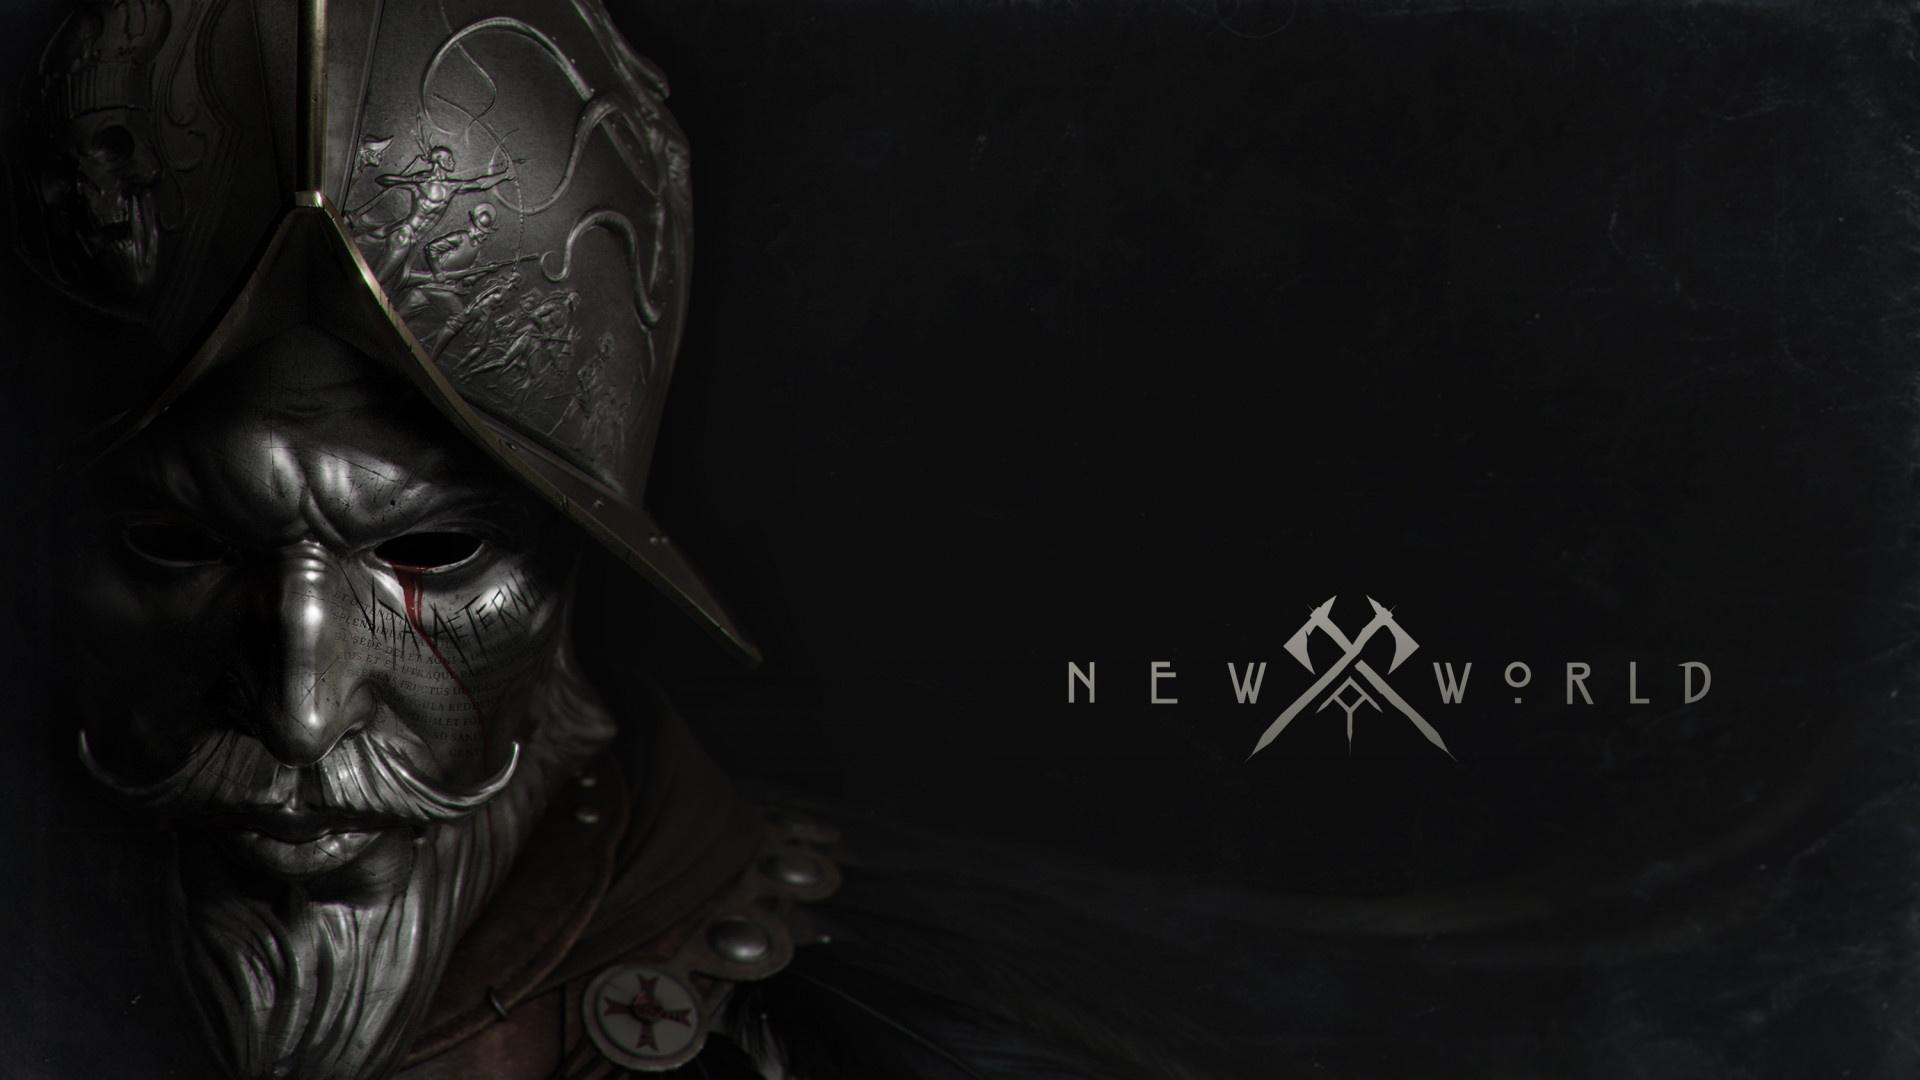 New World wallpaper hd